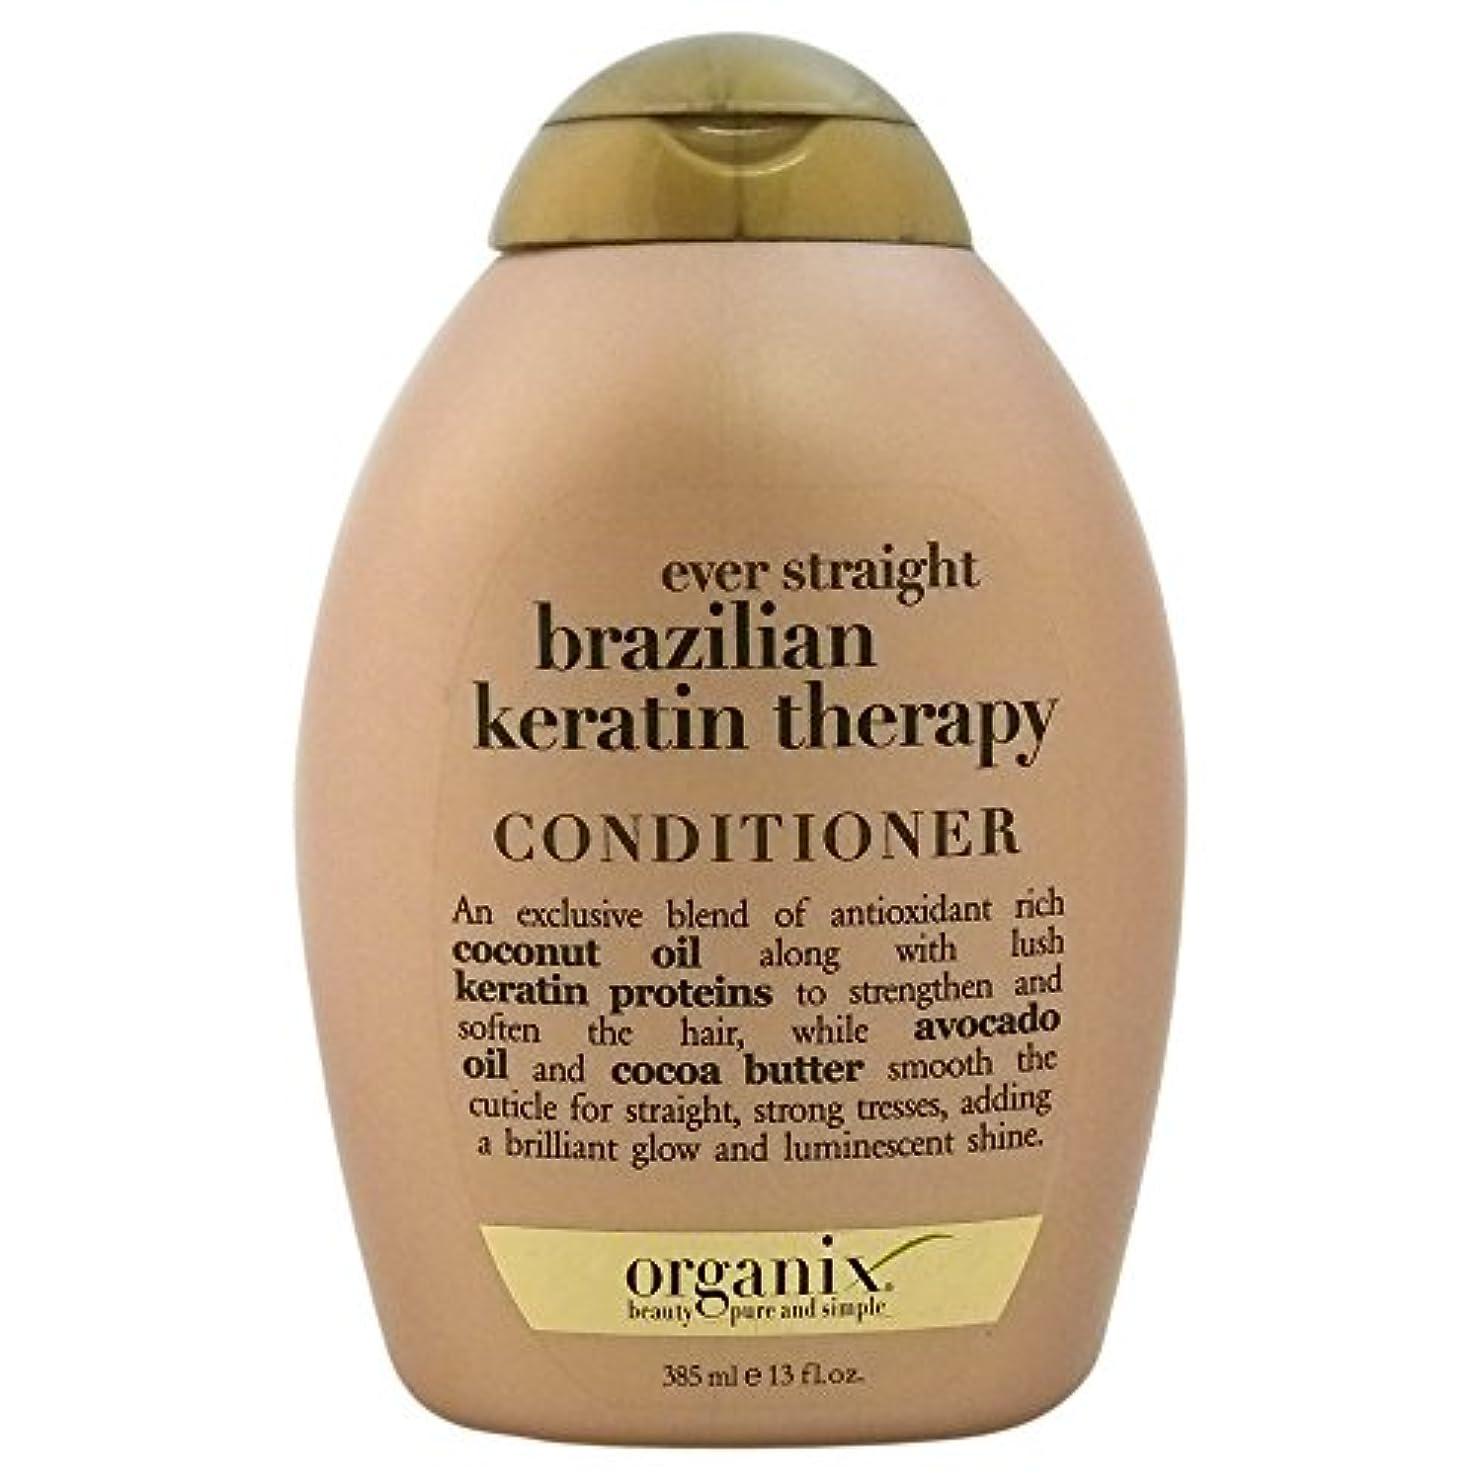 Organix Conditioner Brazilian Keratin Therapy 385 ml (並行輸入品)